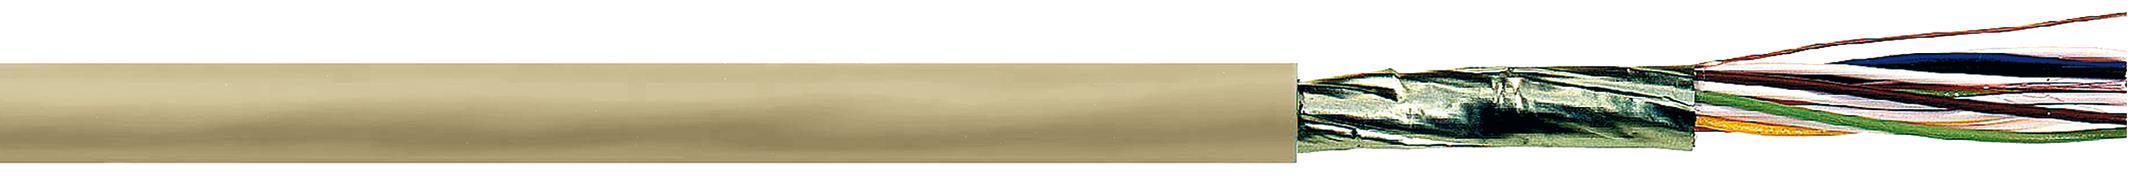 j y st y 2x2x0 8 trommel 500m adalbert zajadacz gmbh co kg. Black Bedroom Furniture Sets. Home Design Ideas